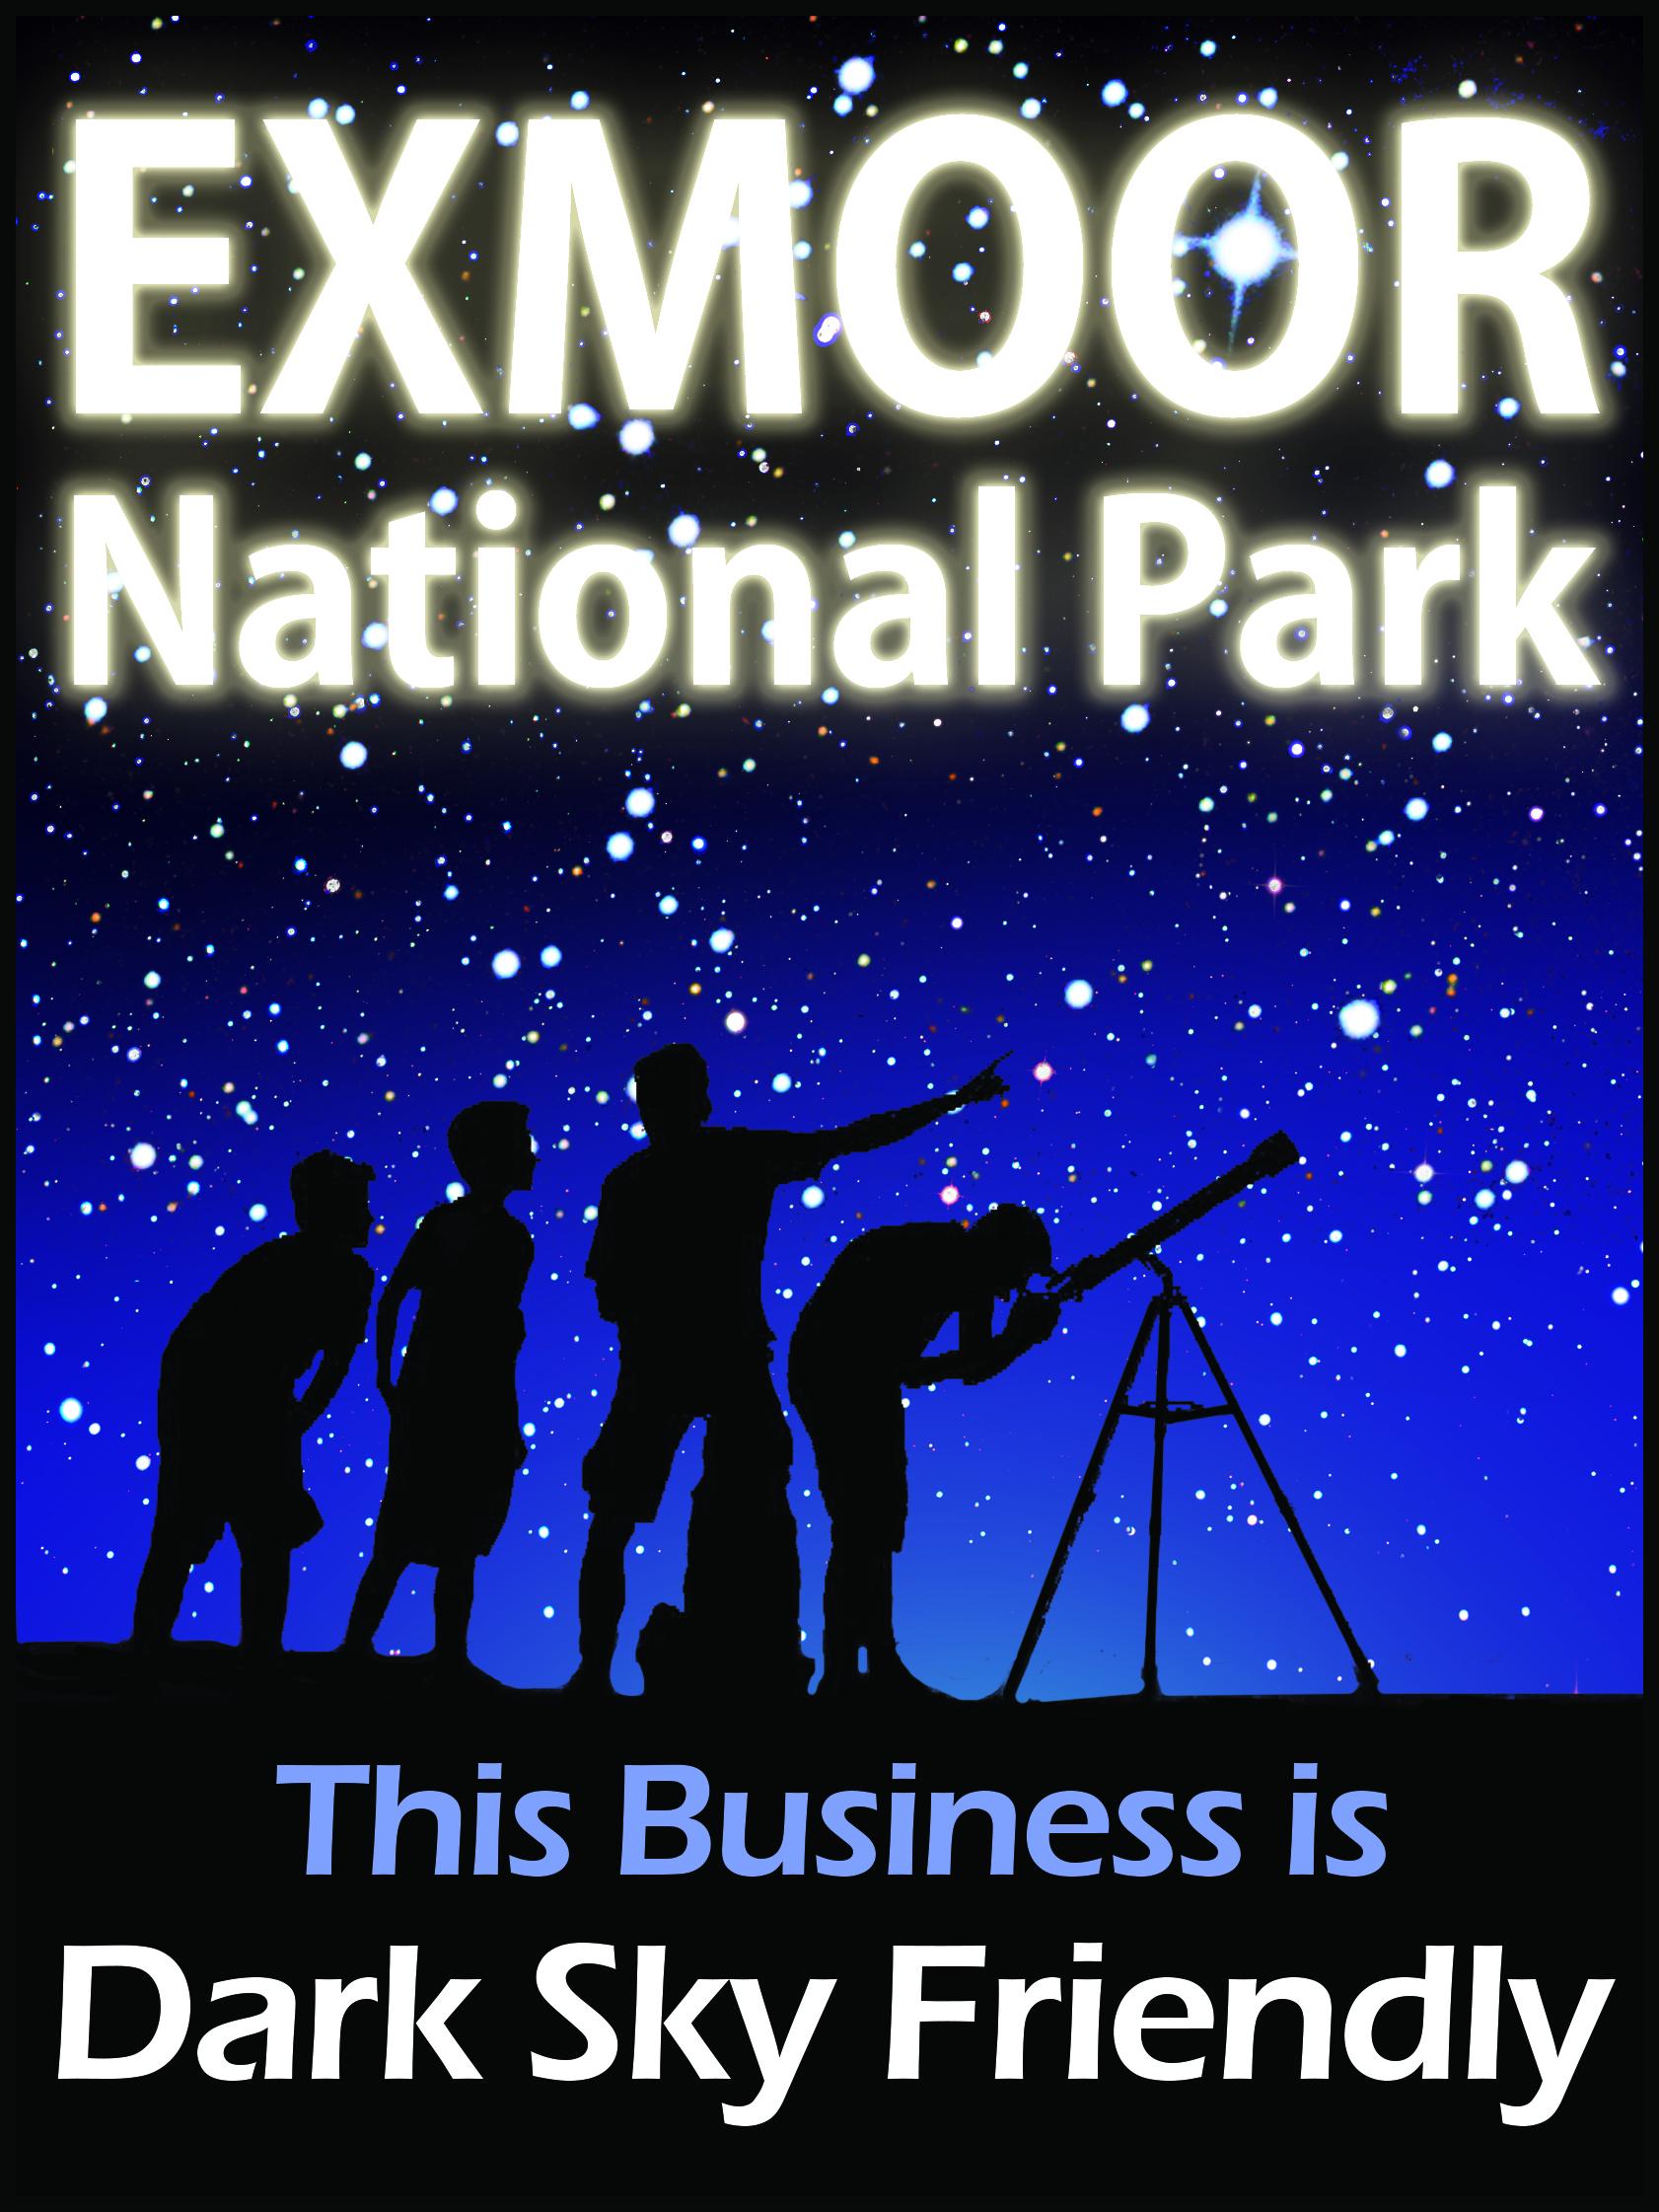 Exmoor Dark Sky Friendly Businesses